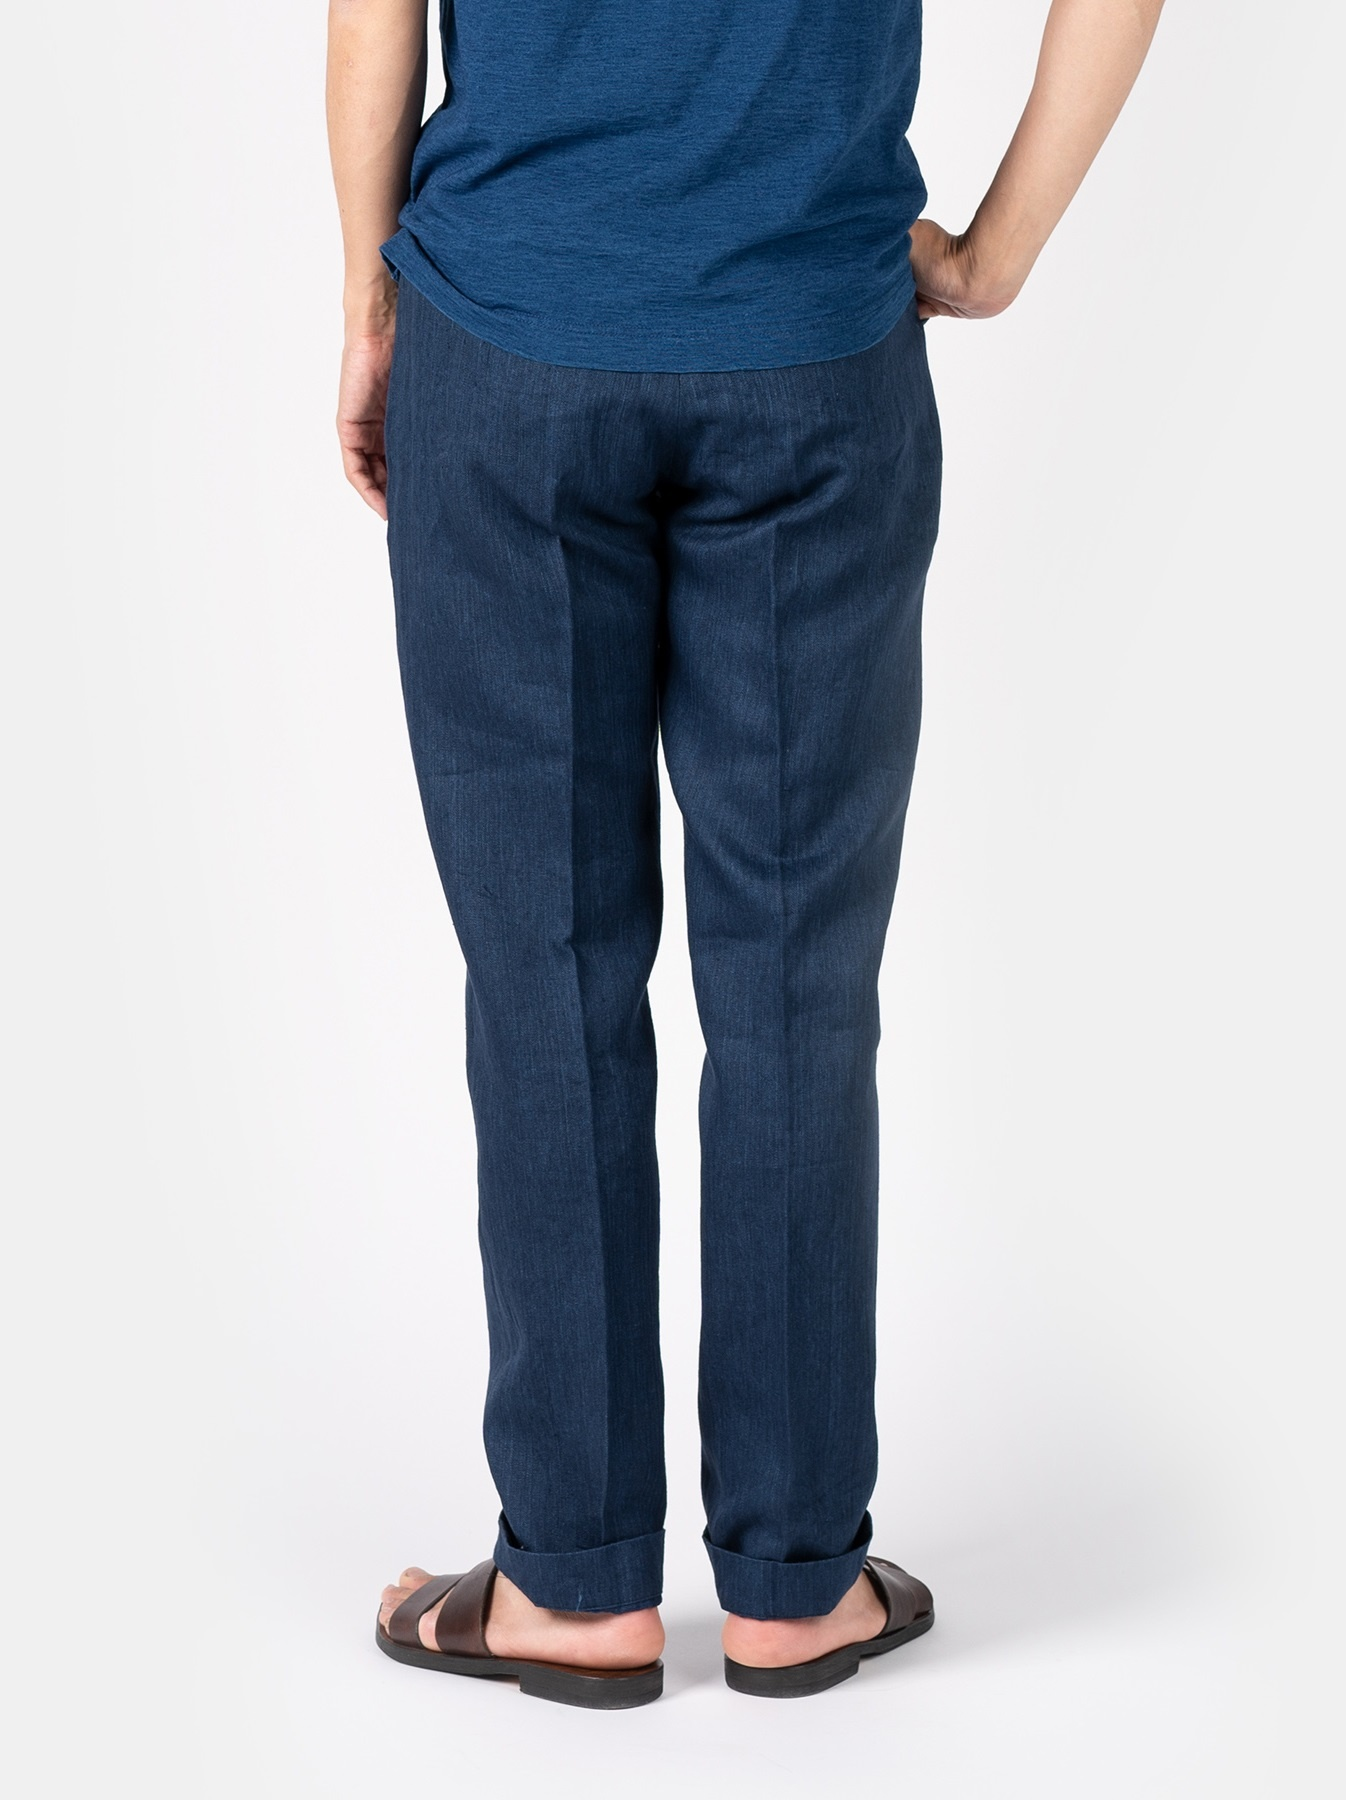 WH Indigo Linen Easy Slacks-5